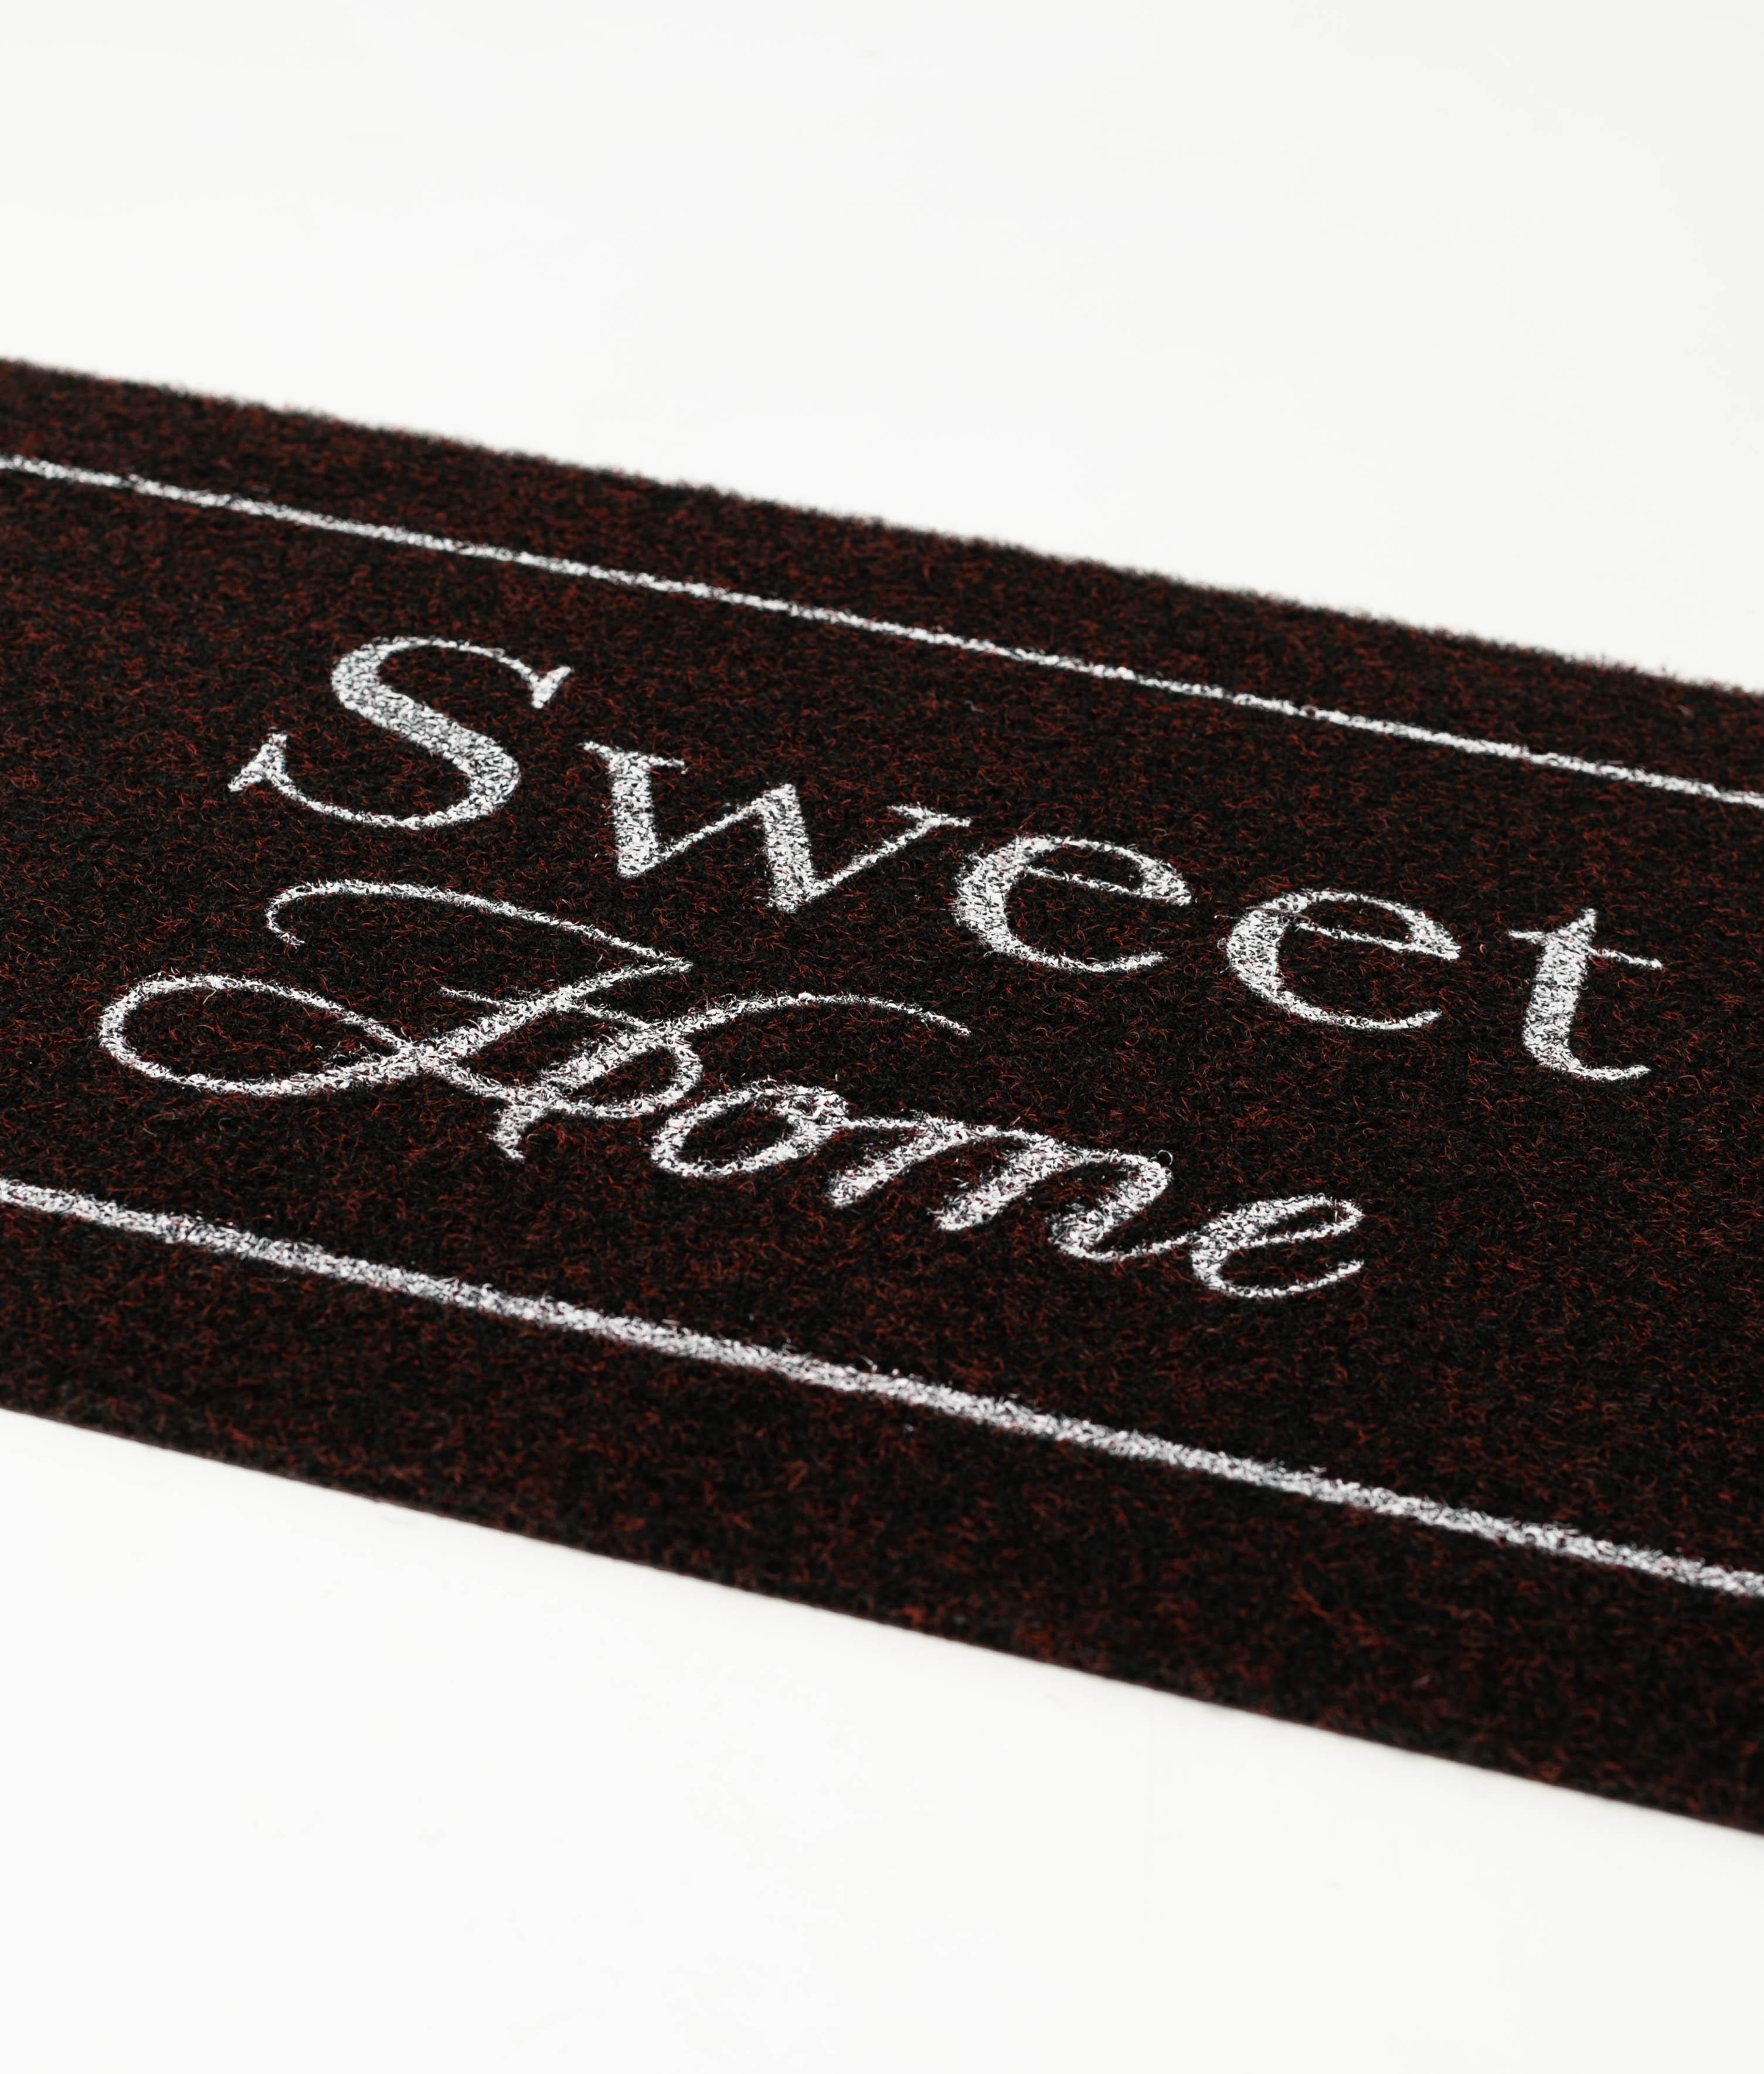 FELPUDO SENEC - SWEET HOME